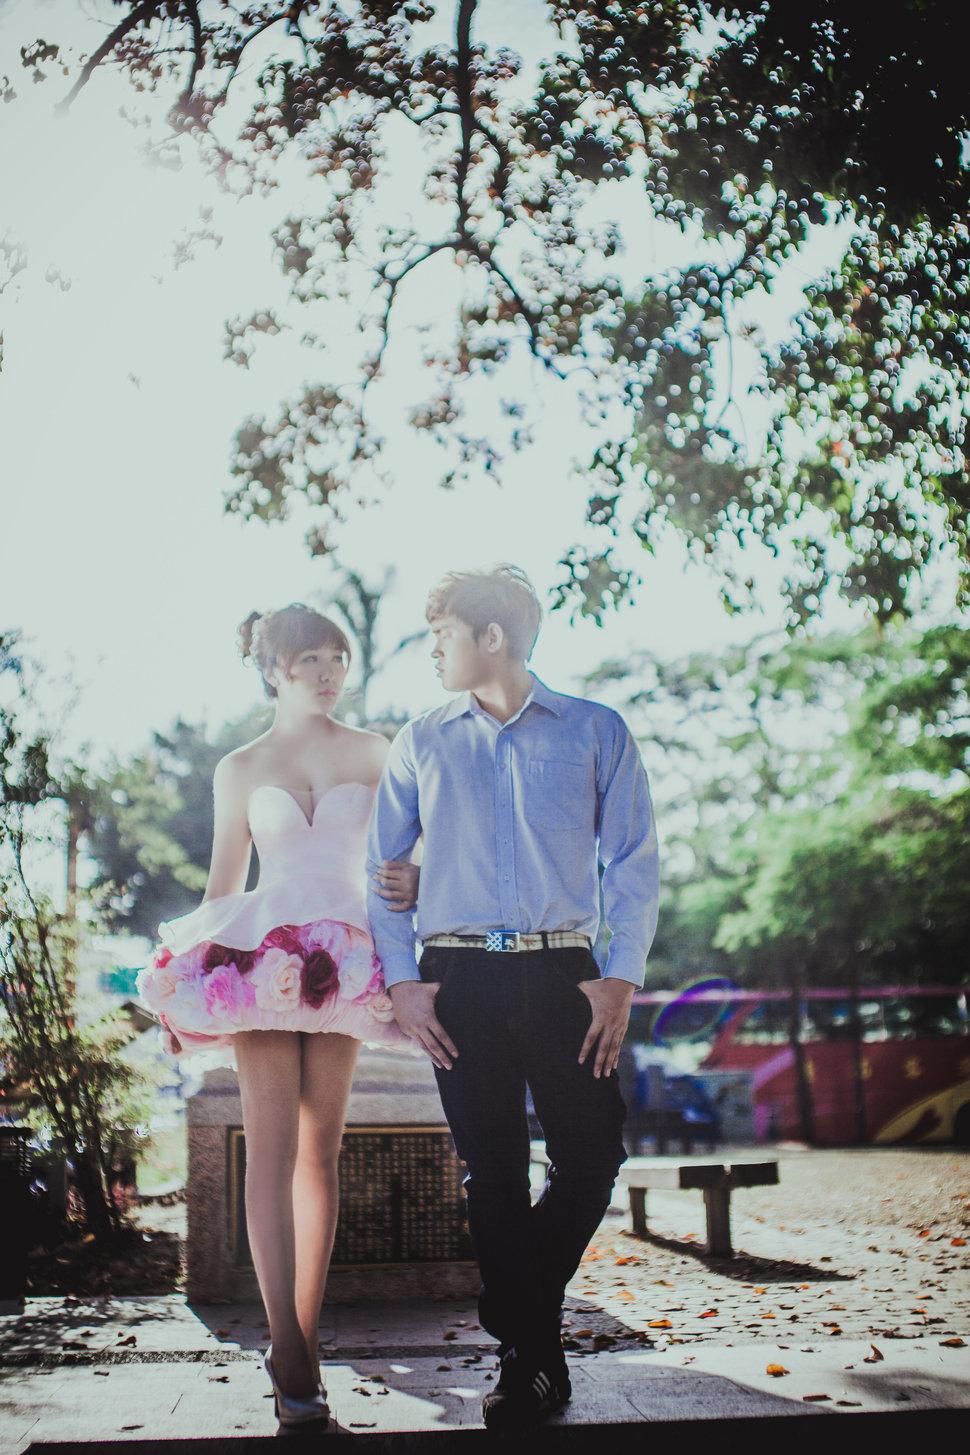 IMG_7982 - 虎尾帝芬妮 - 結婚吧